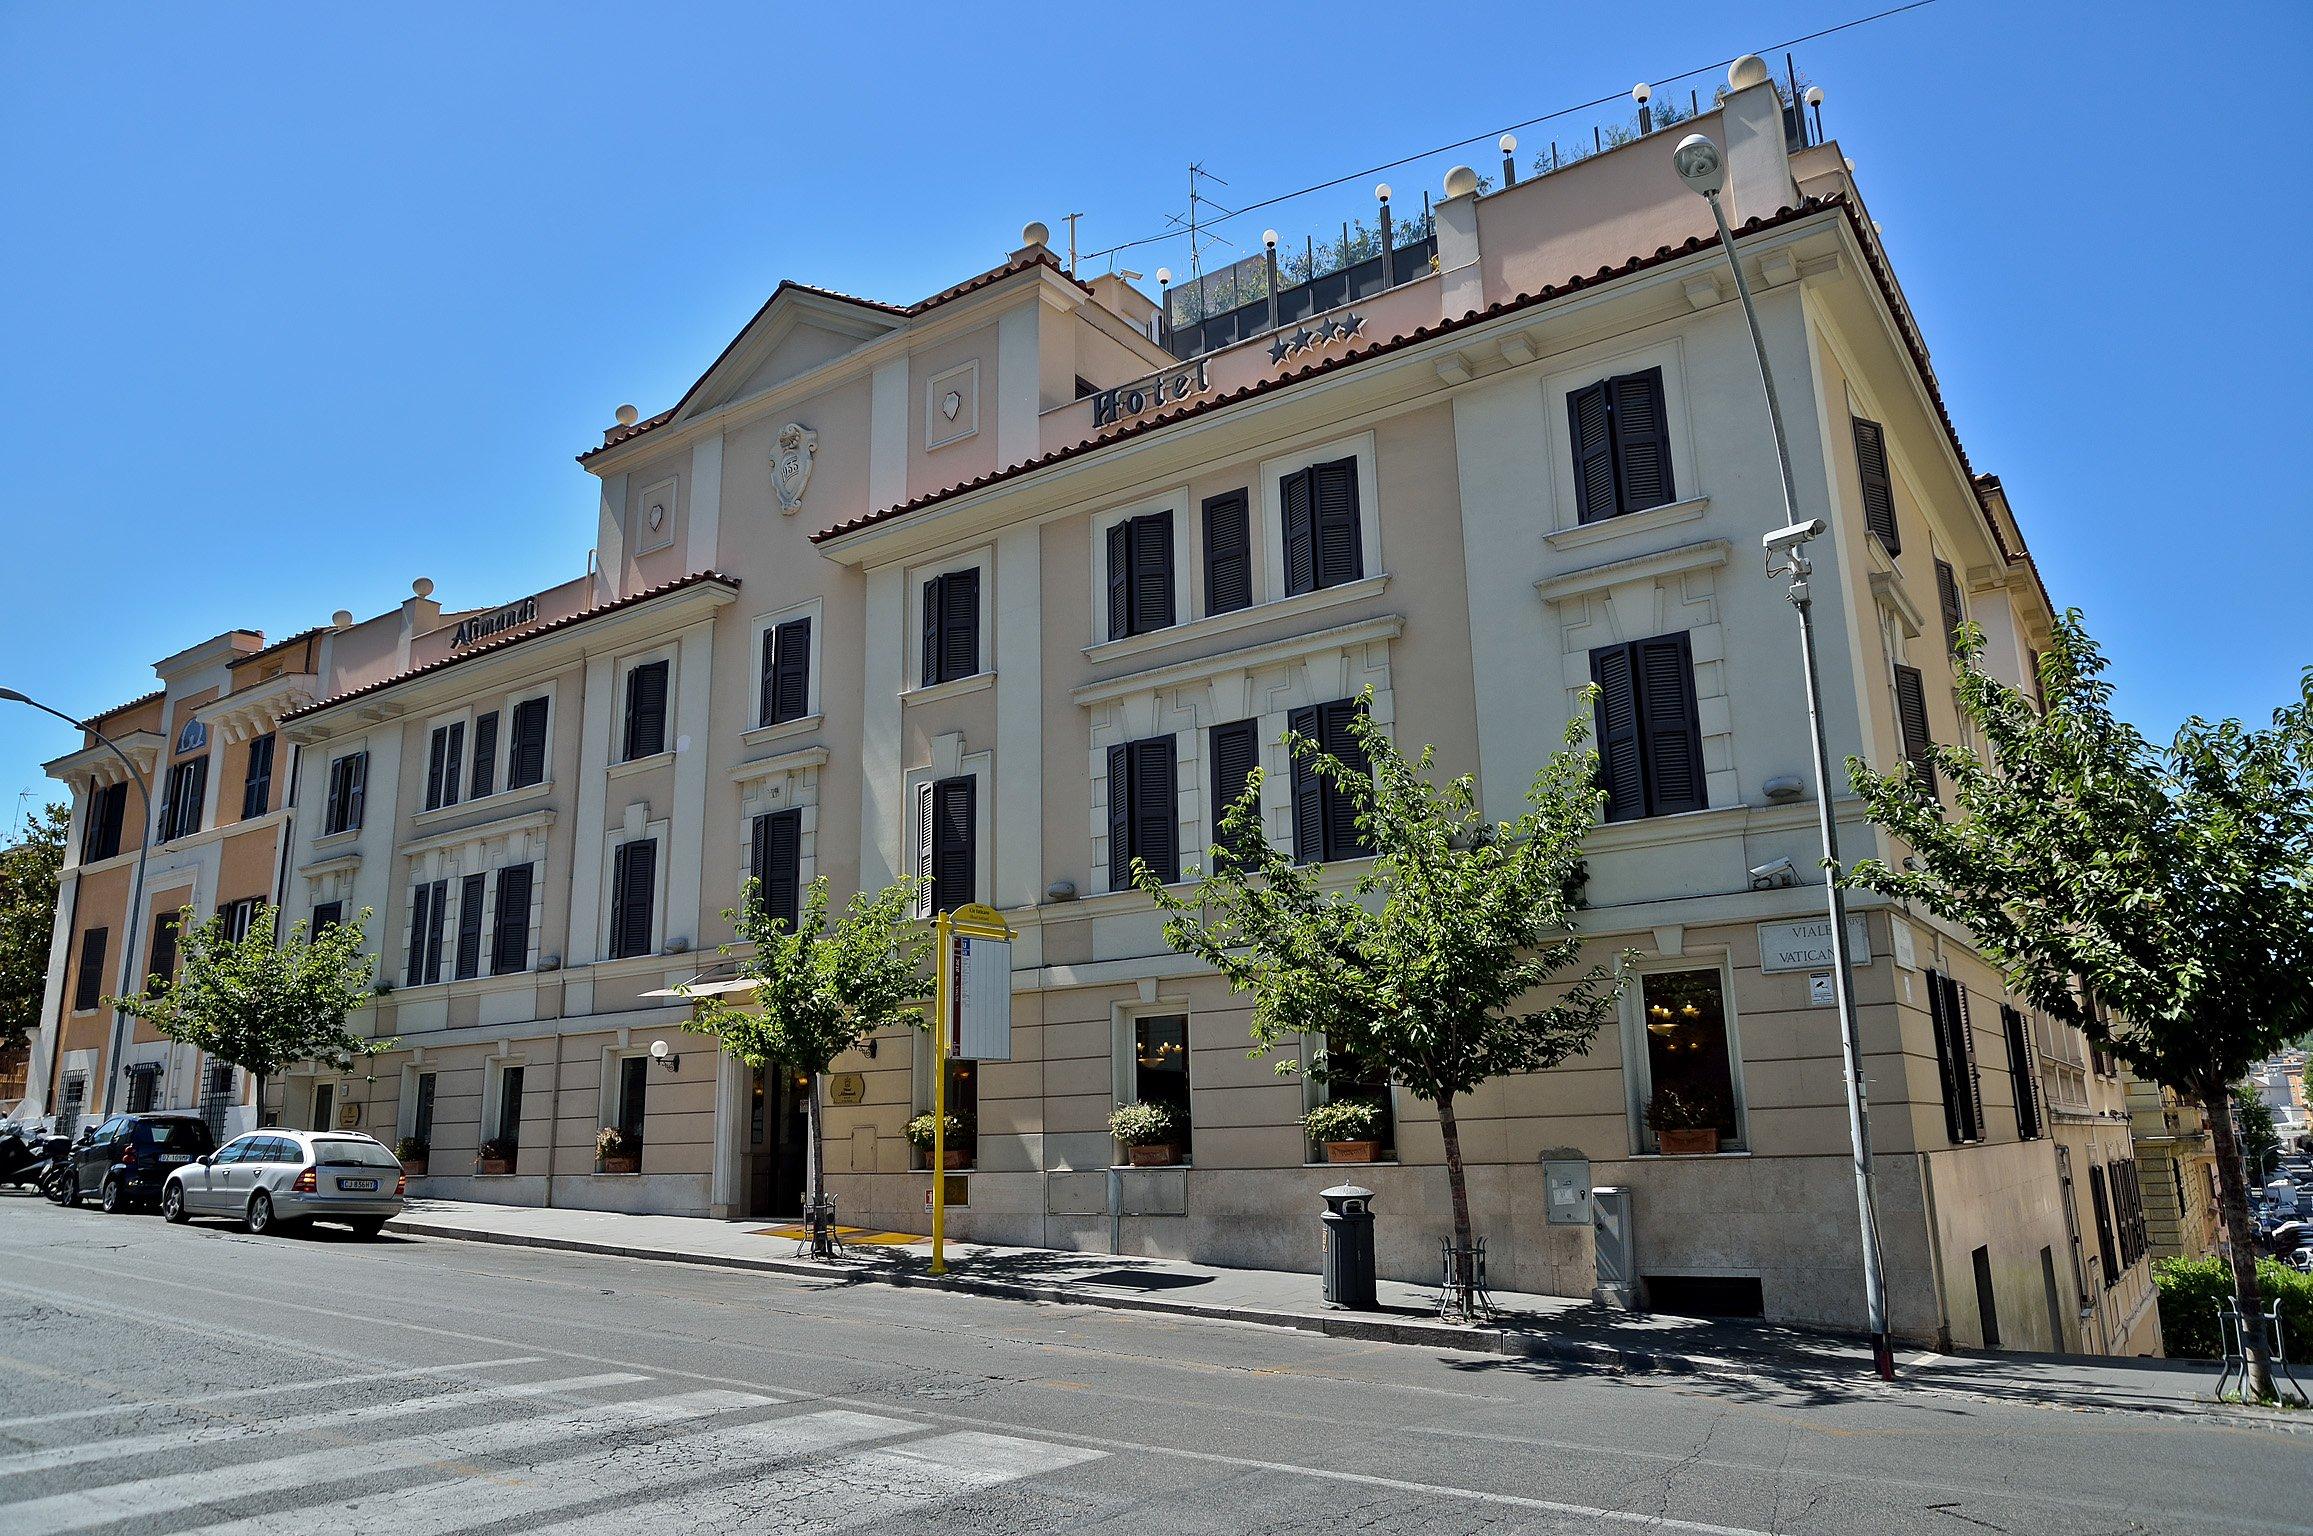 Hotel Alimandi Vaticano